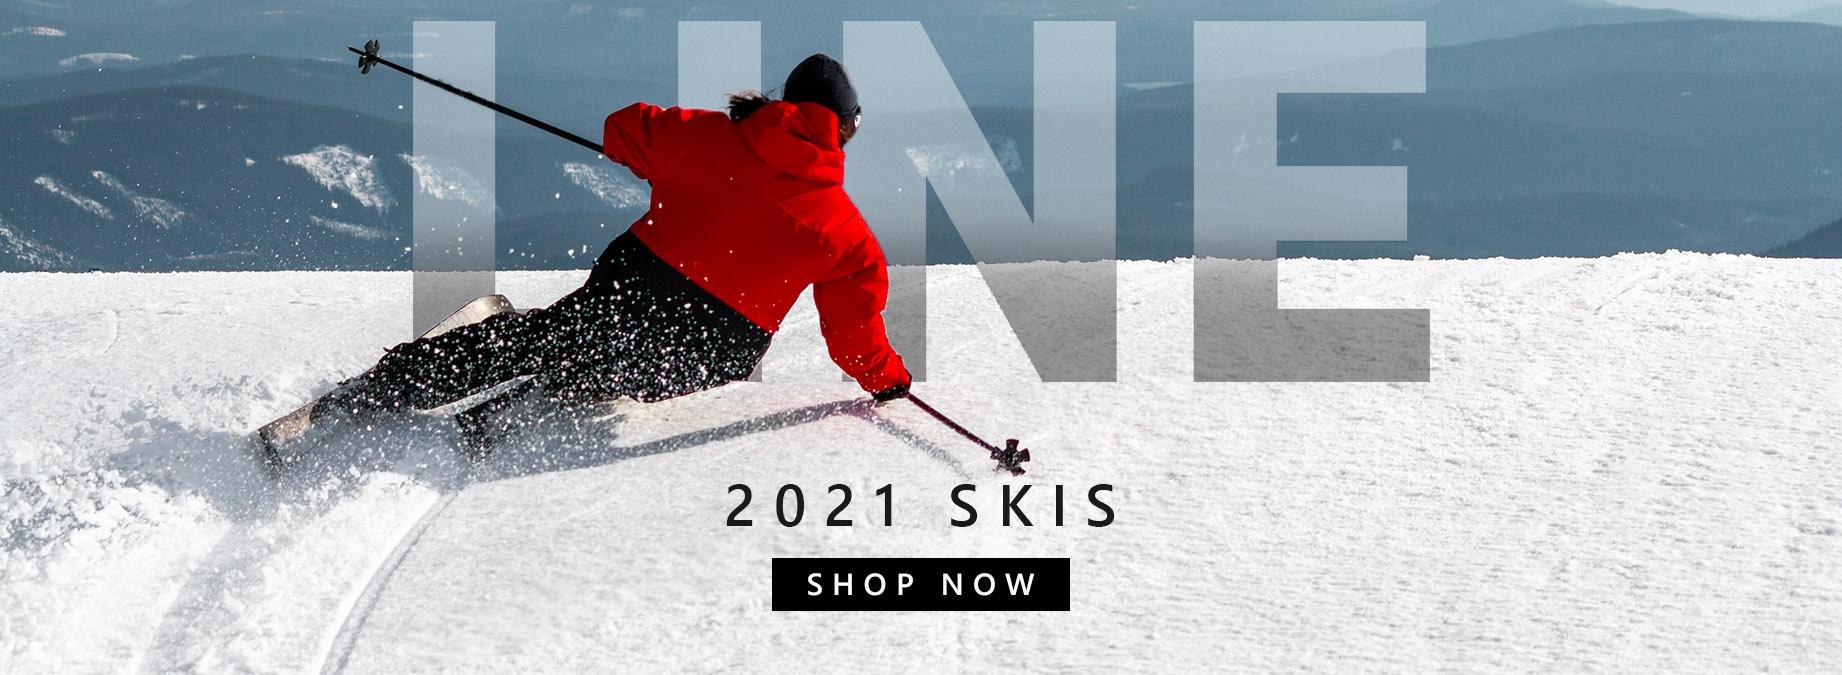 2021 Line Skis